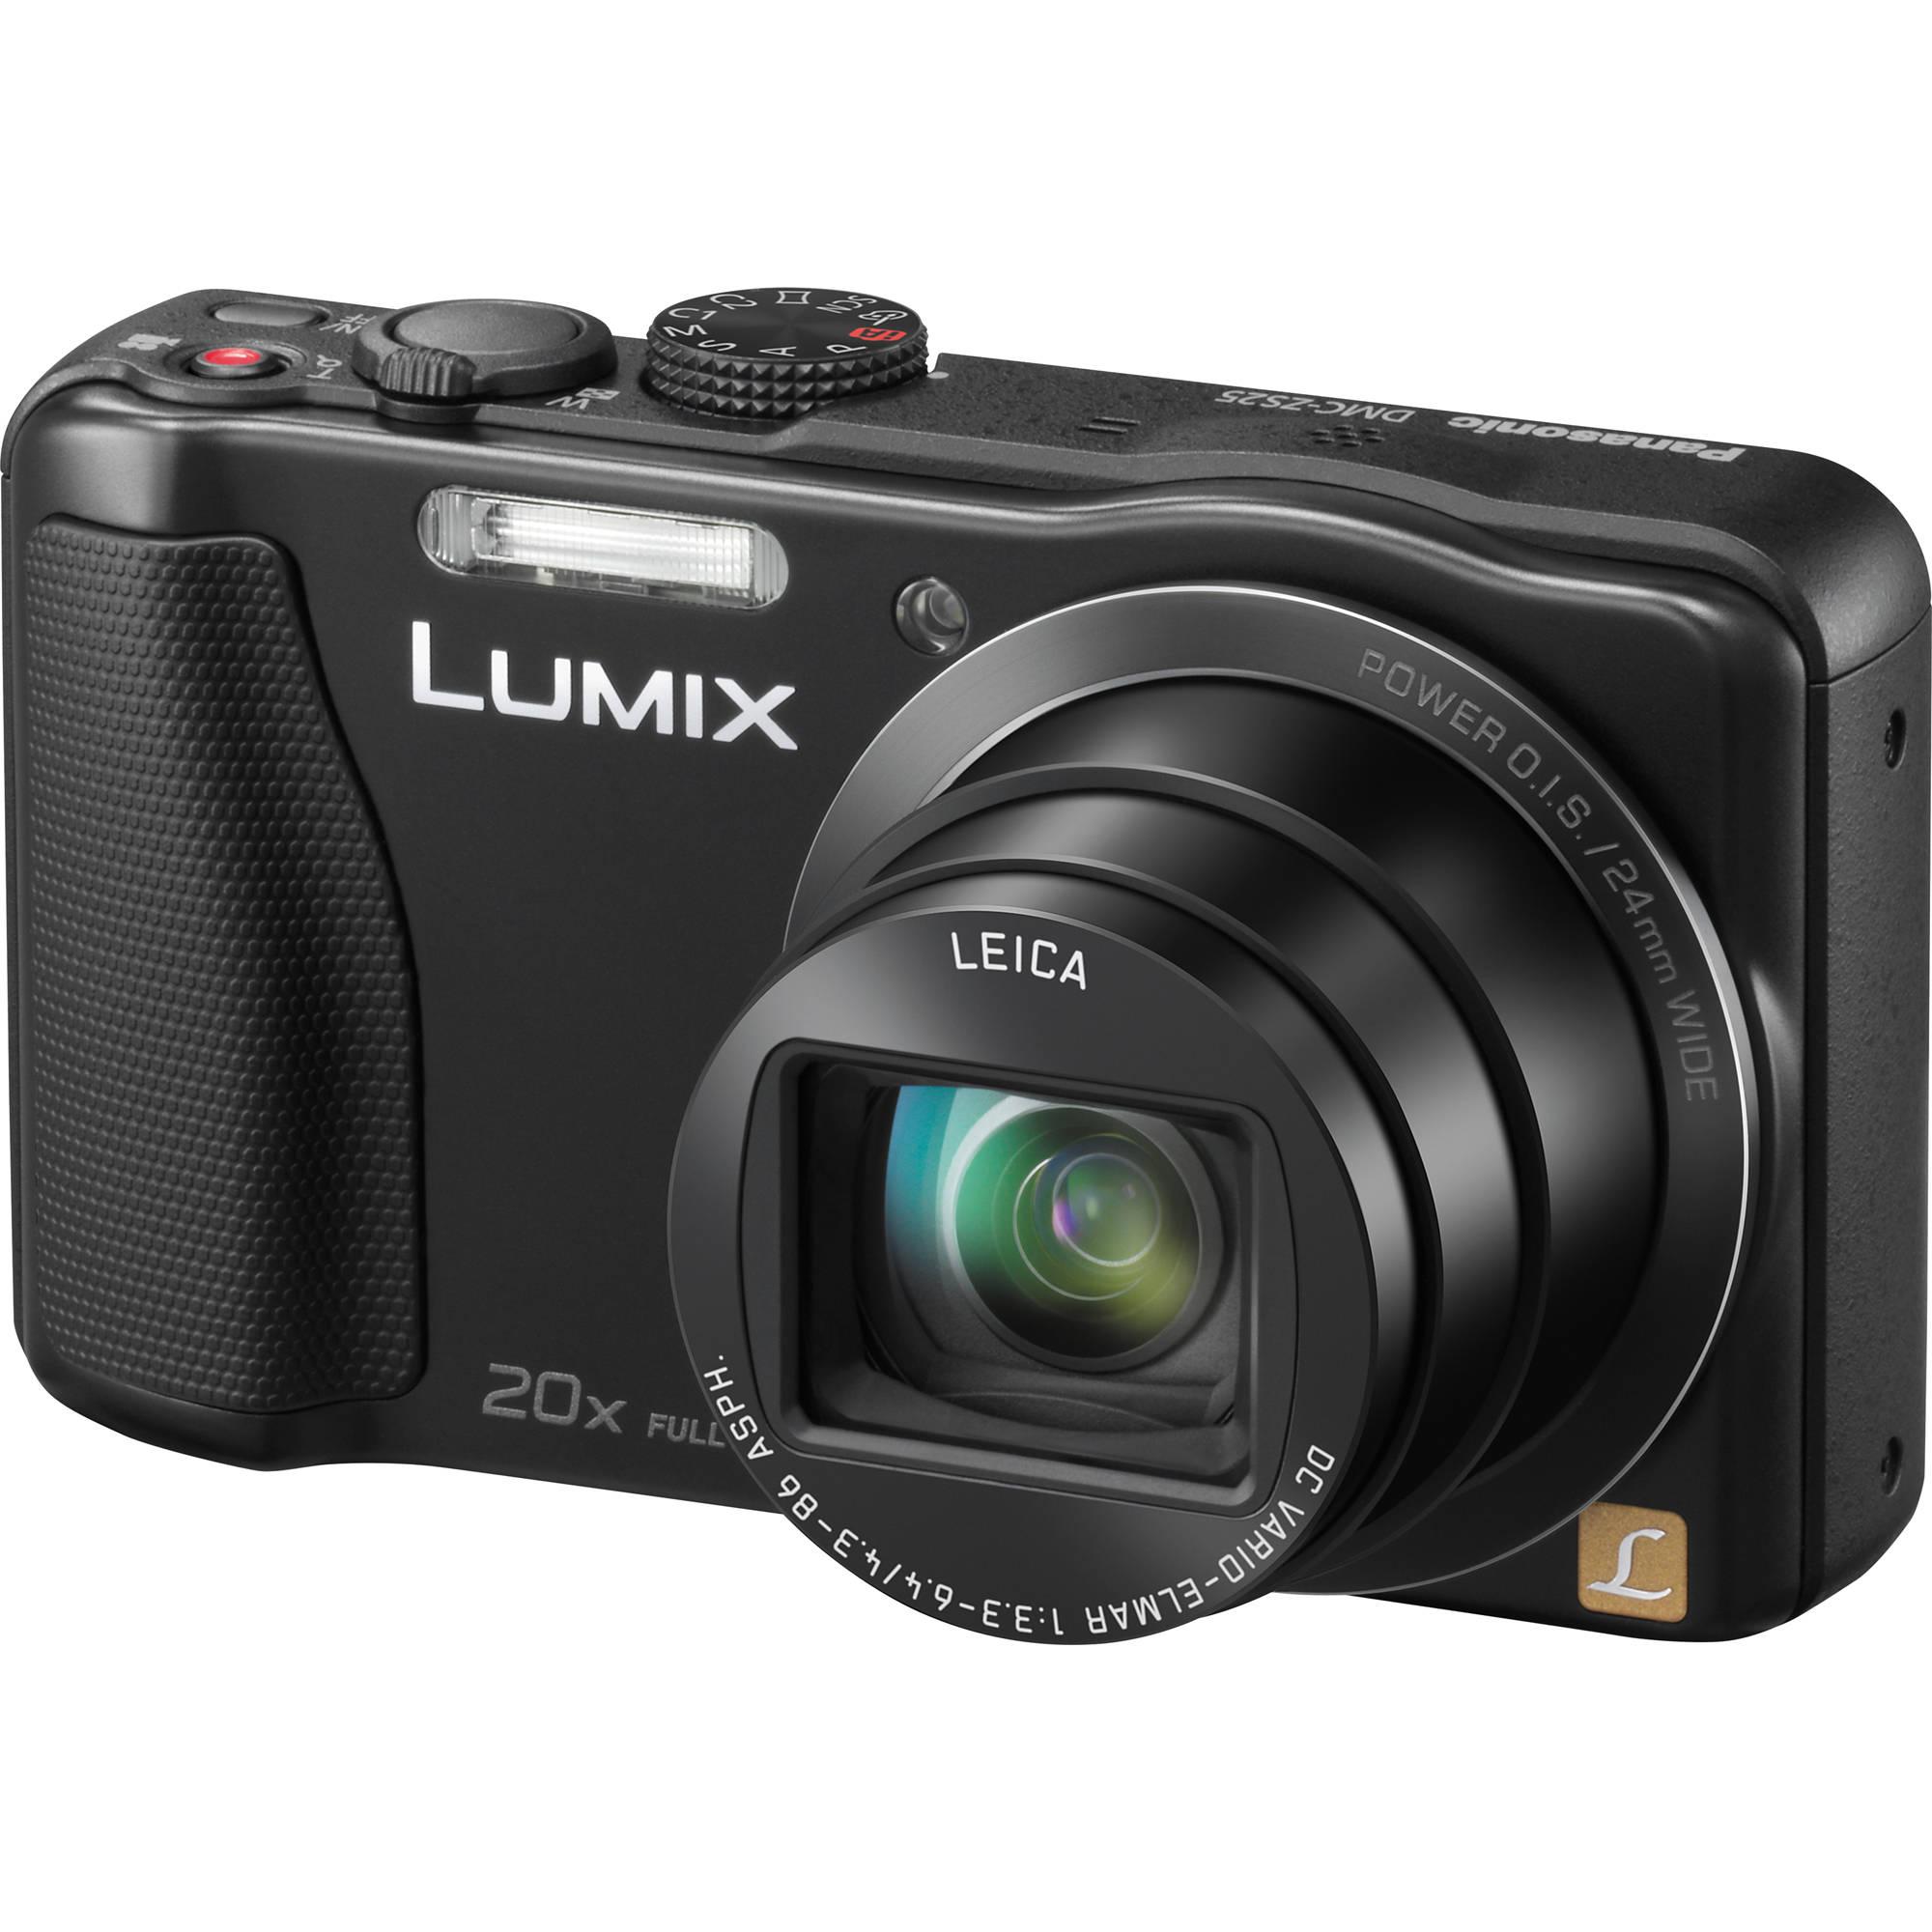 Panasonic Lumix DMC-ZS25 Digital Camera (Black) DMC-ZS25K B&H